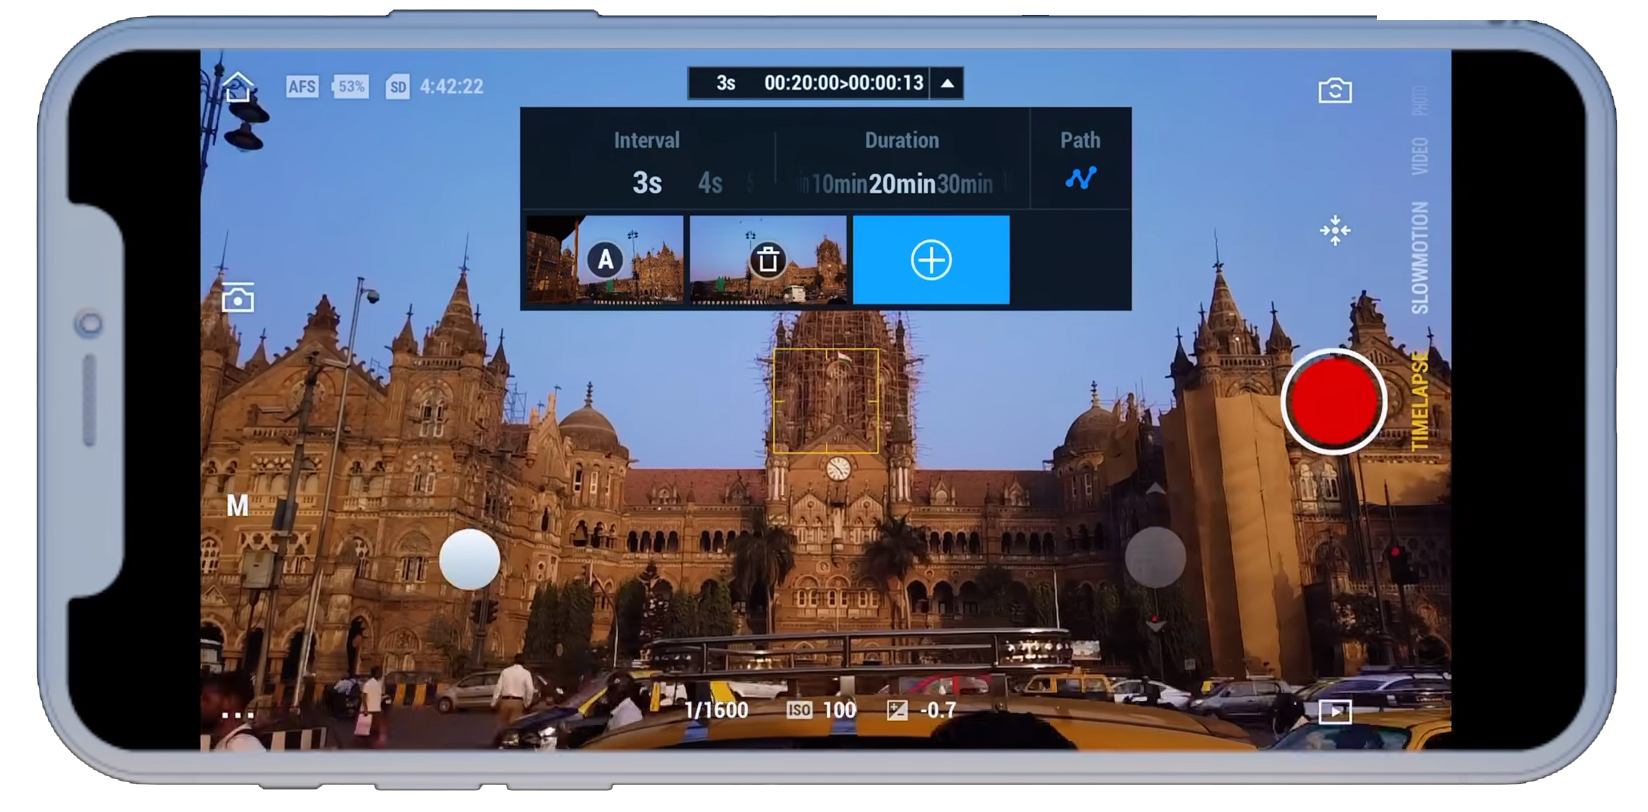 dji_osmo_pocket_camera_4k_timelapse_dji_osmo_pocket_features_dji_gimbal_hindi_review